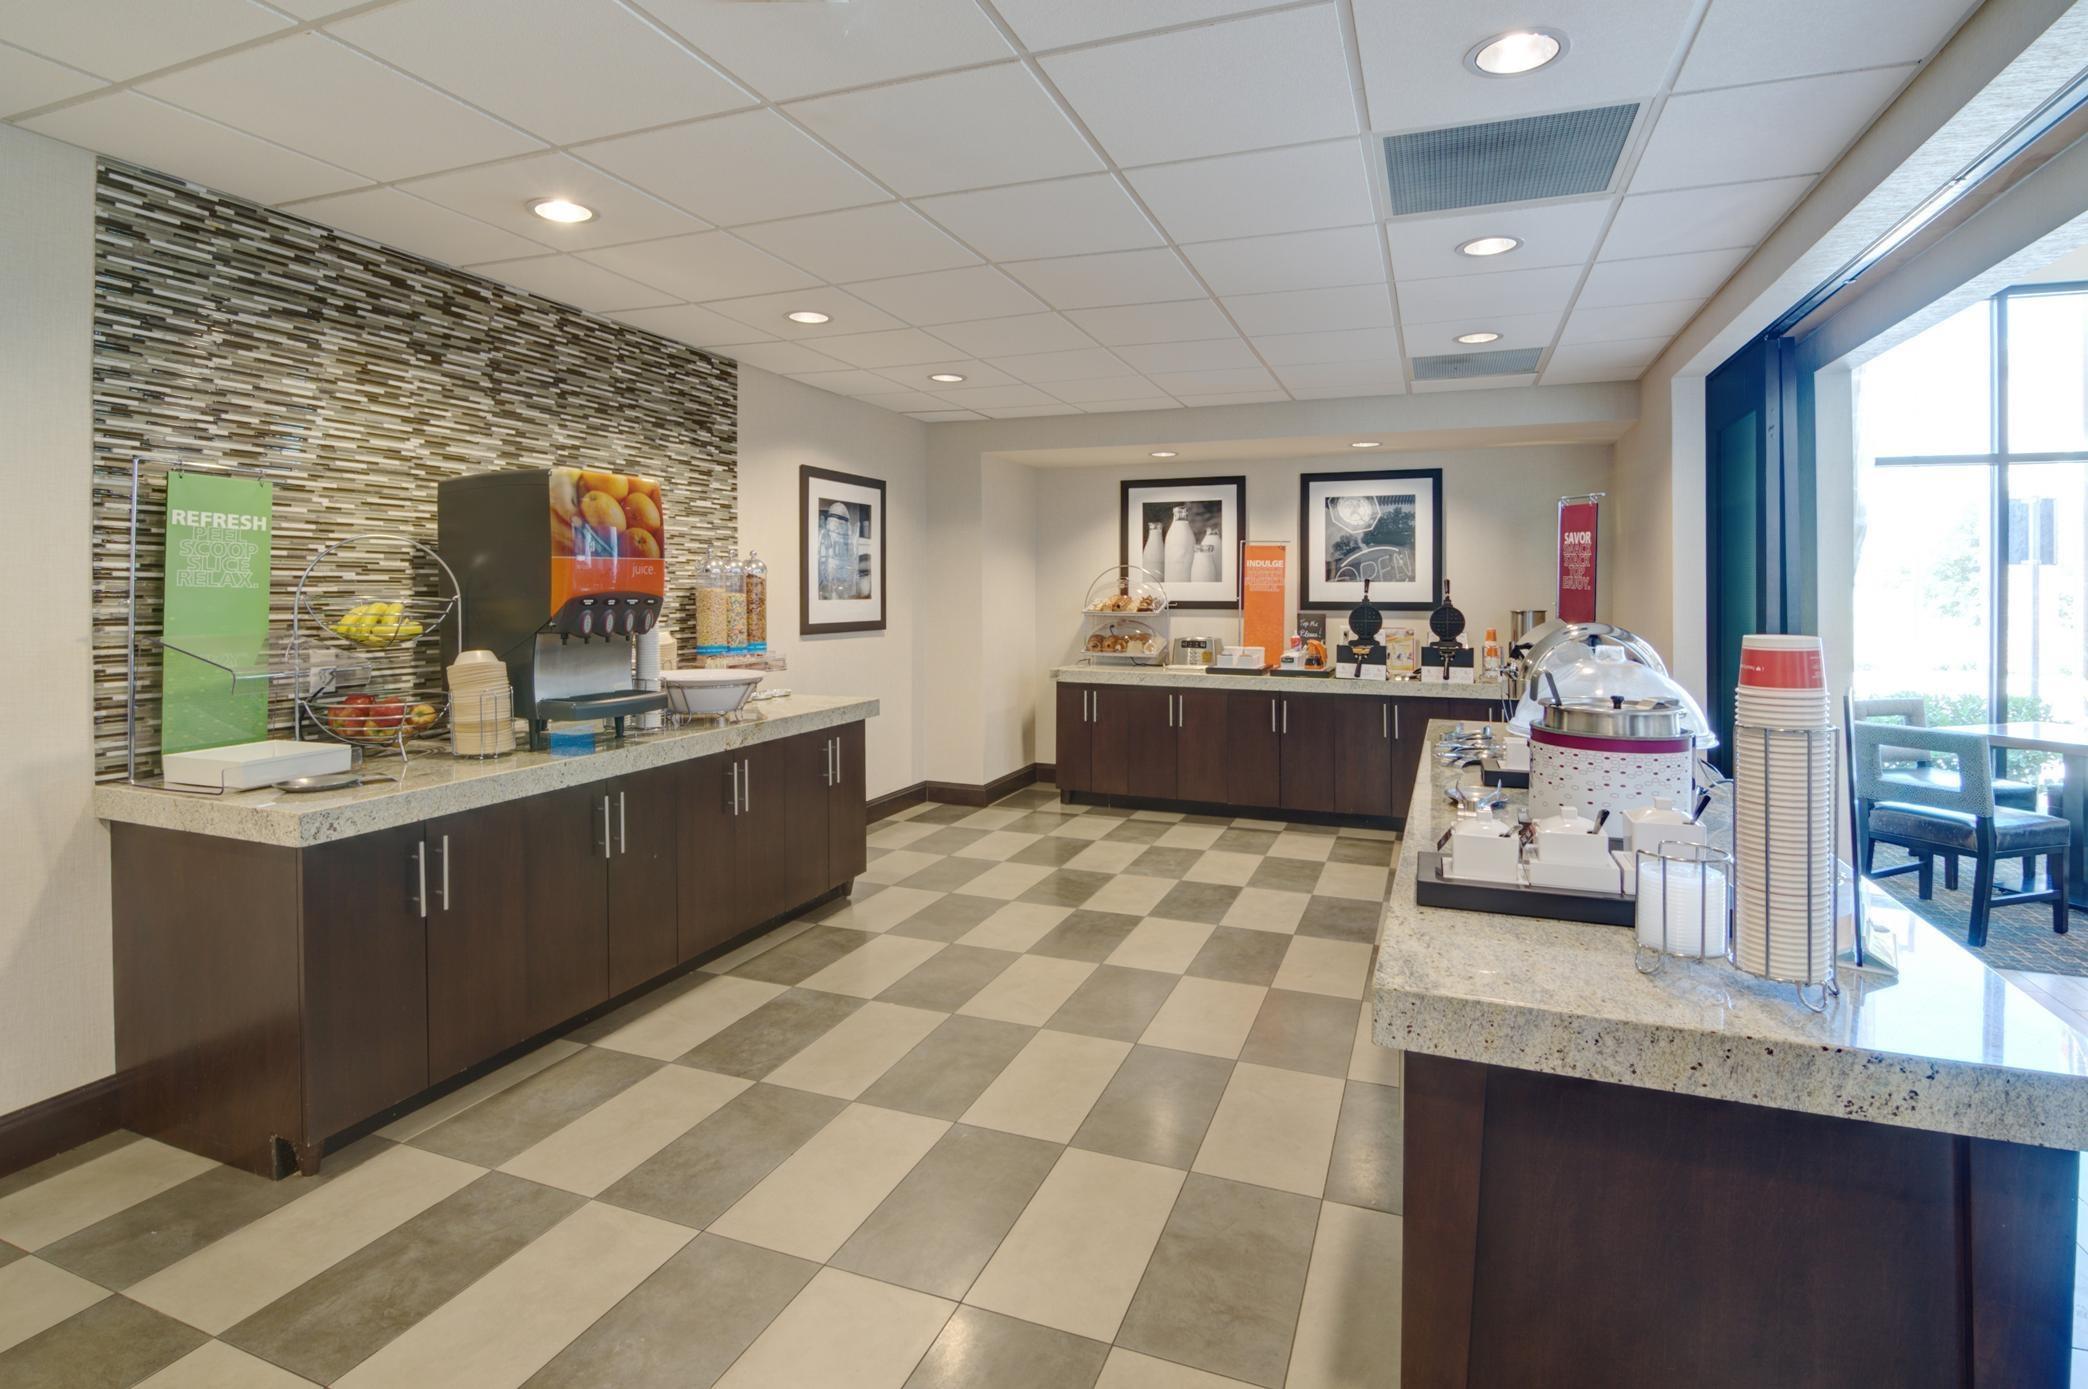 Hampton Inn & Suites Trophy Club - Fort Worth North image 15